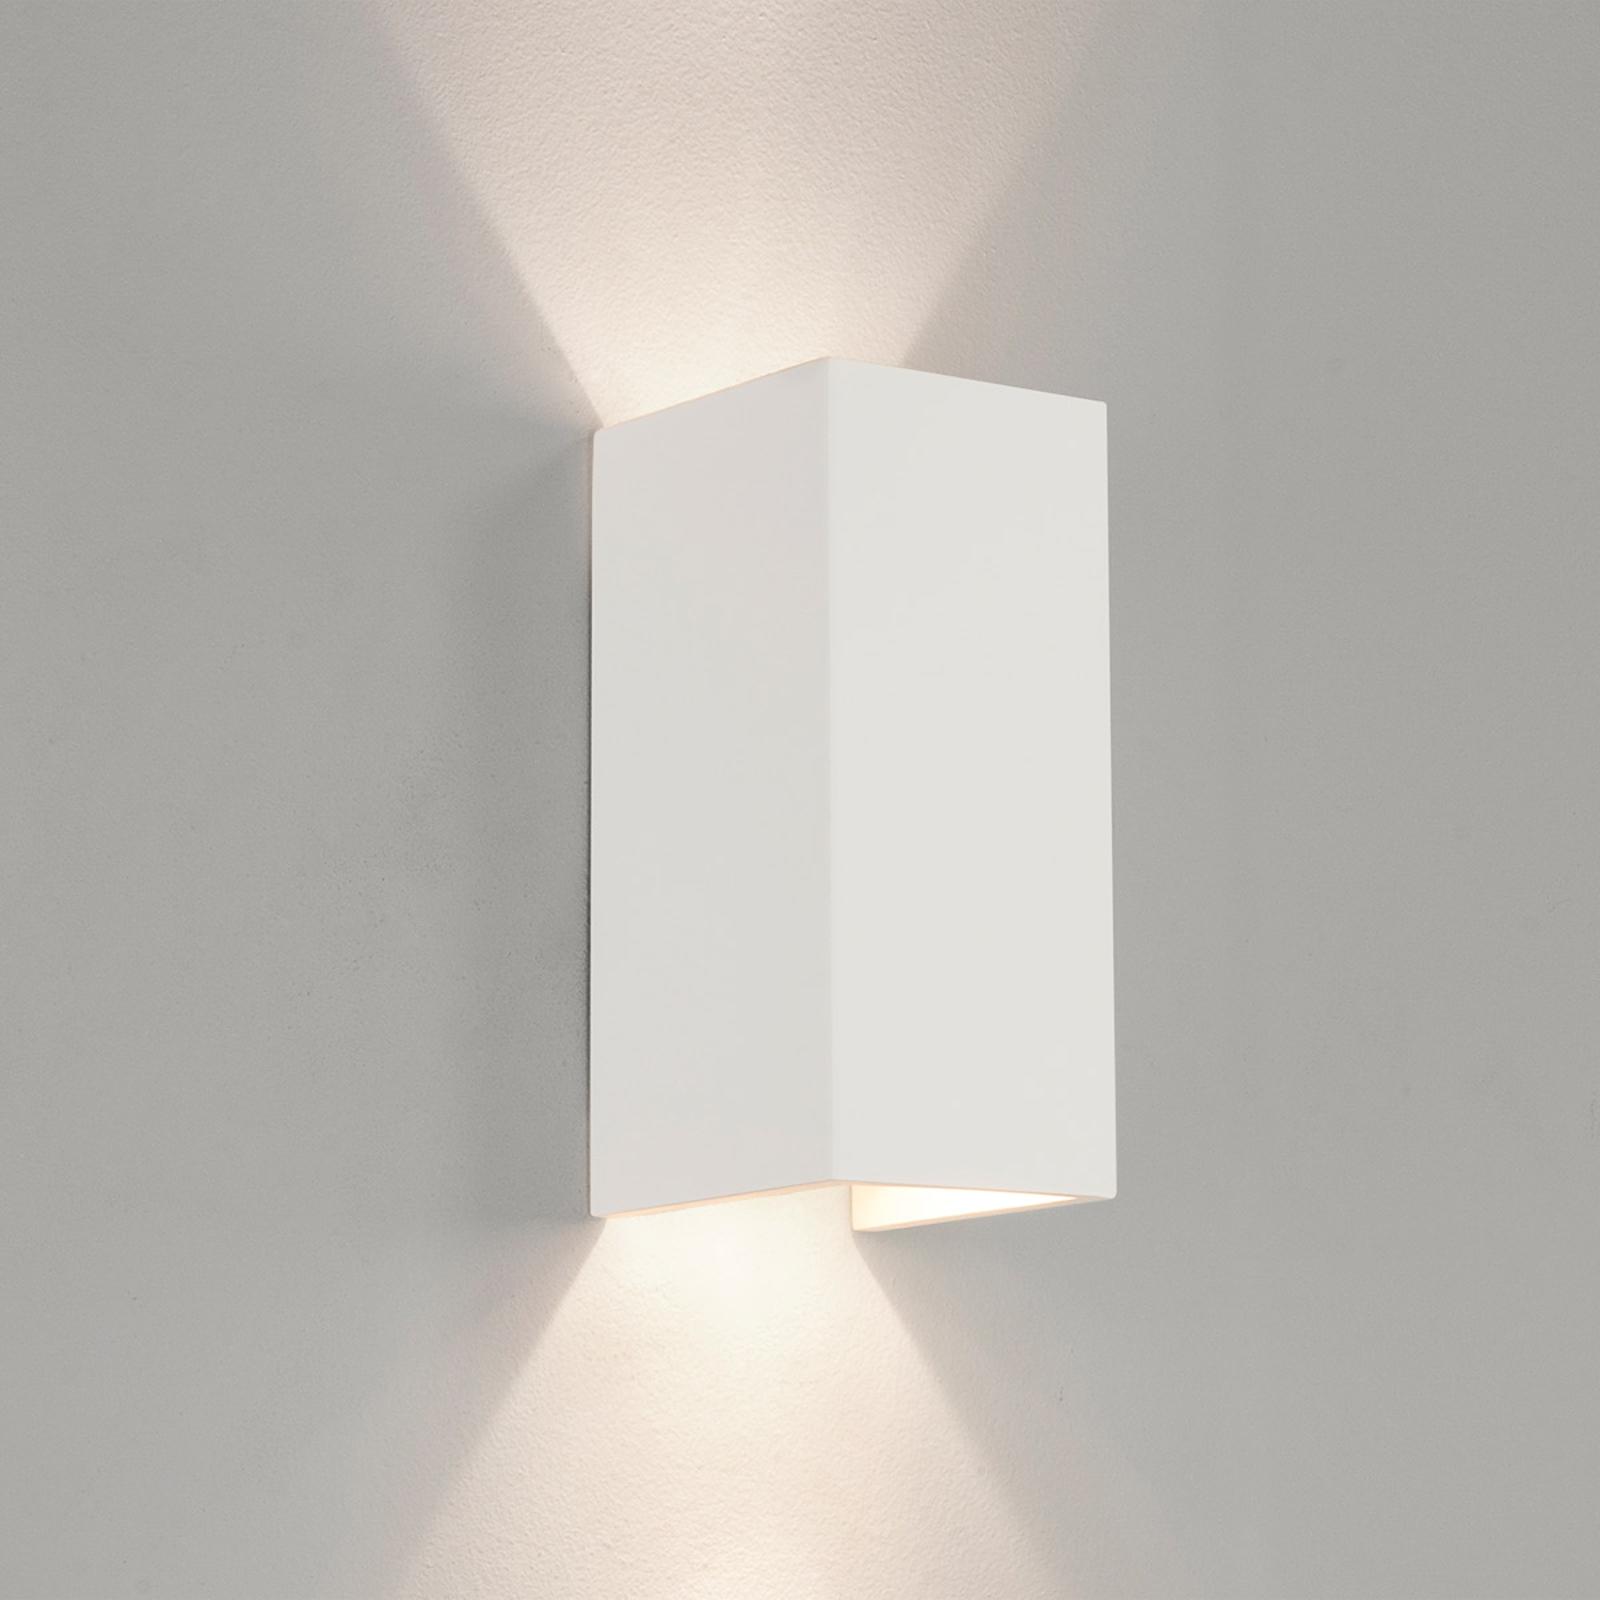 Astro Parma 210 nástenné svietidlo biele_1020346_1